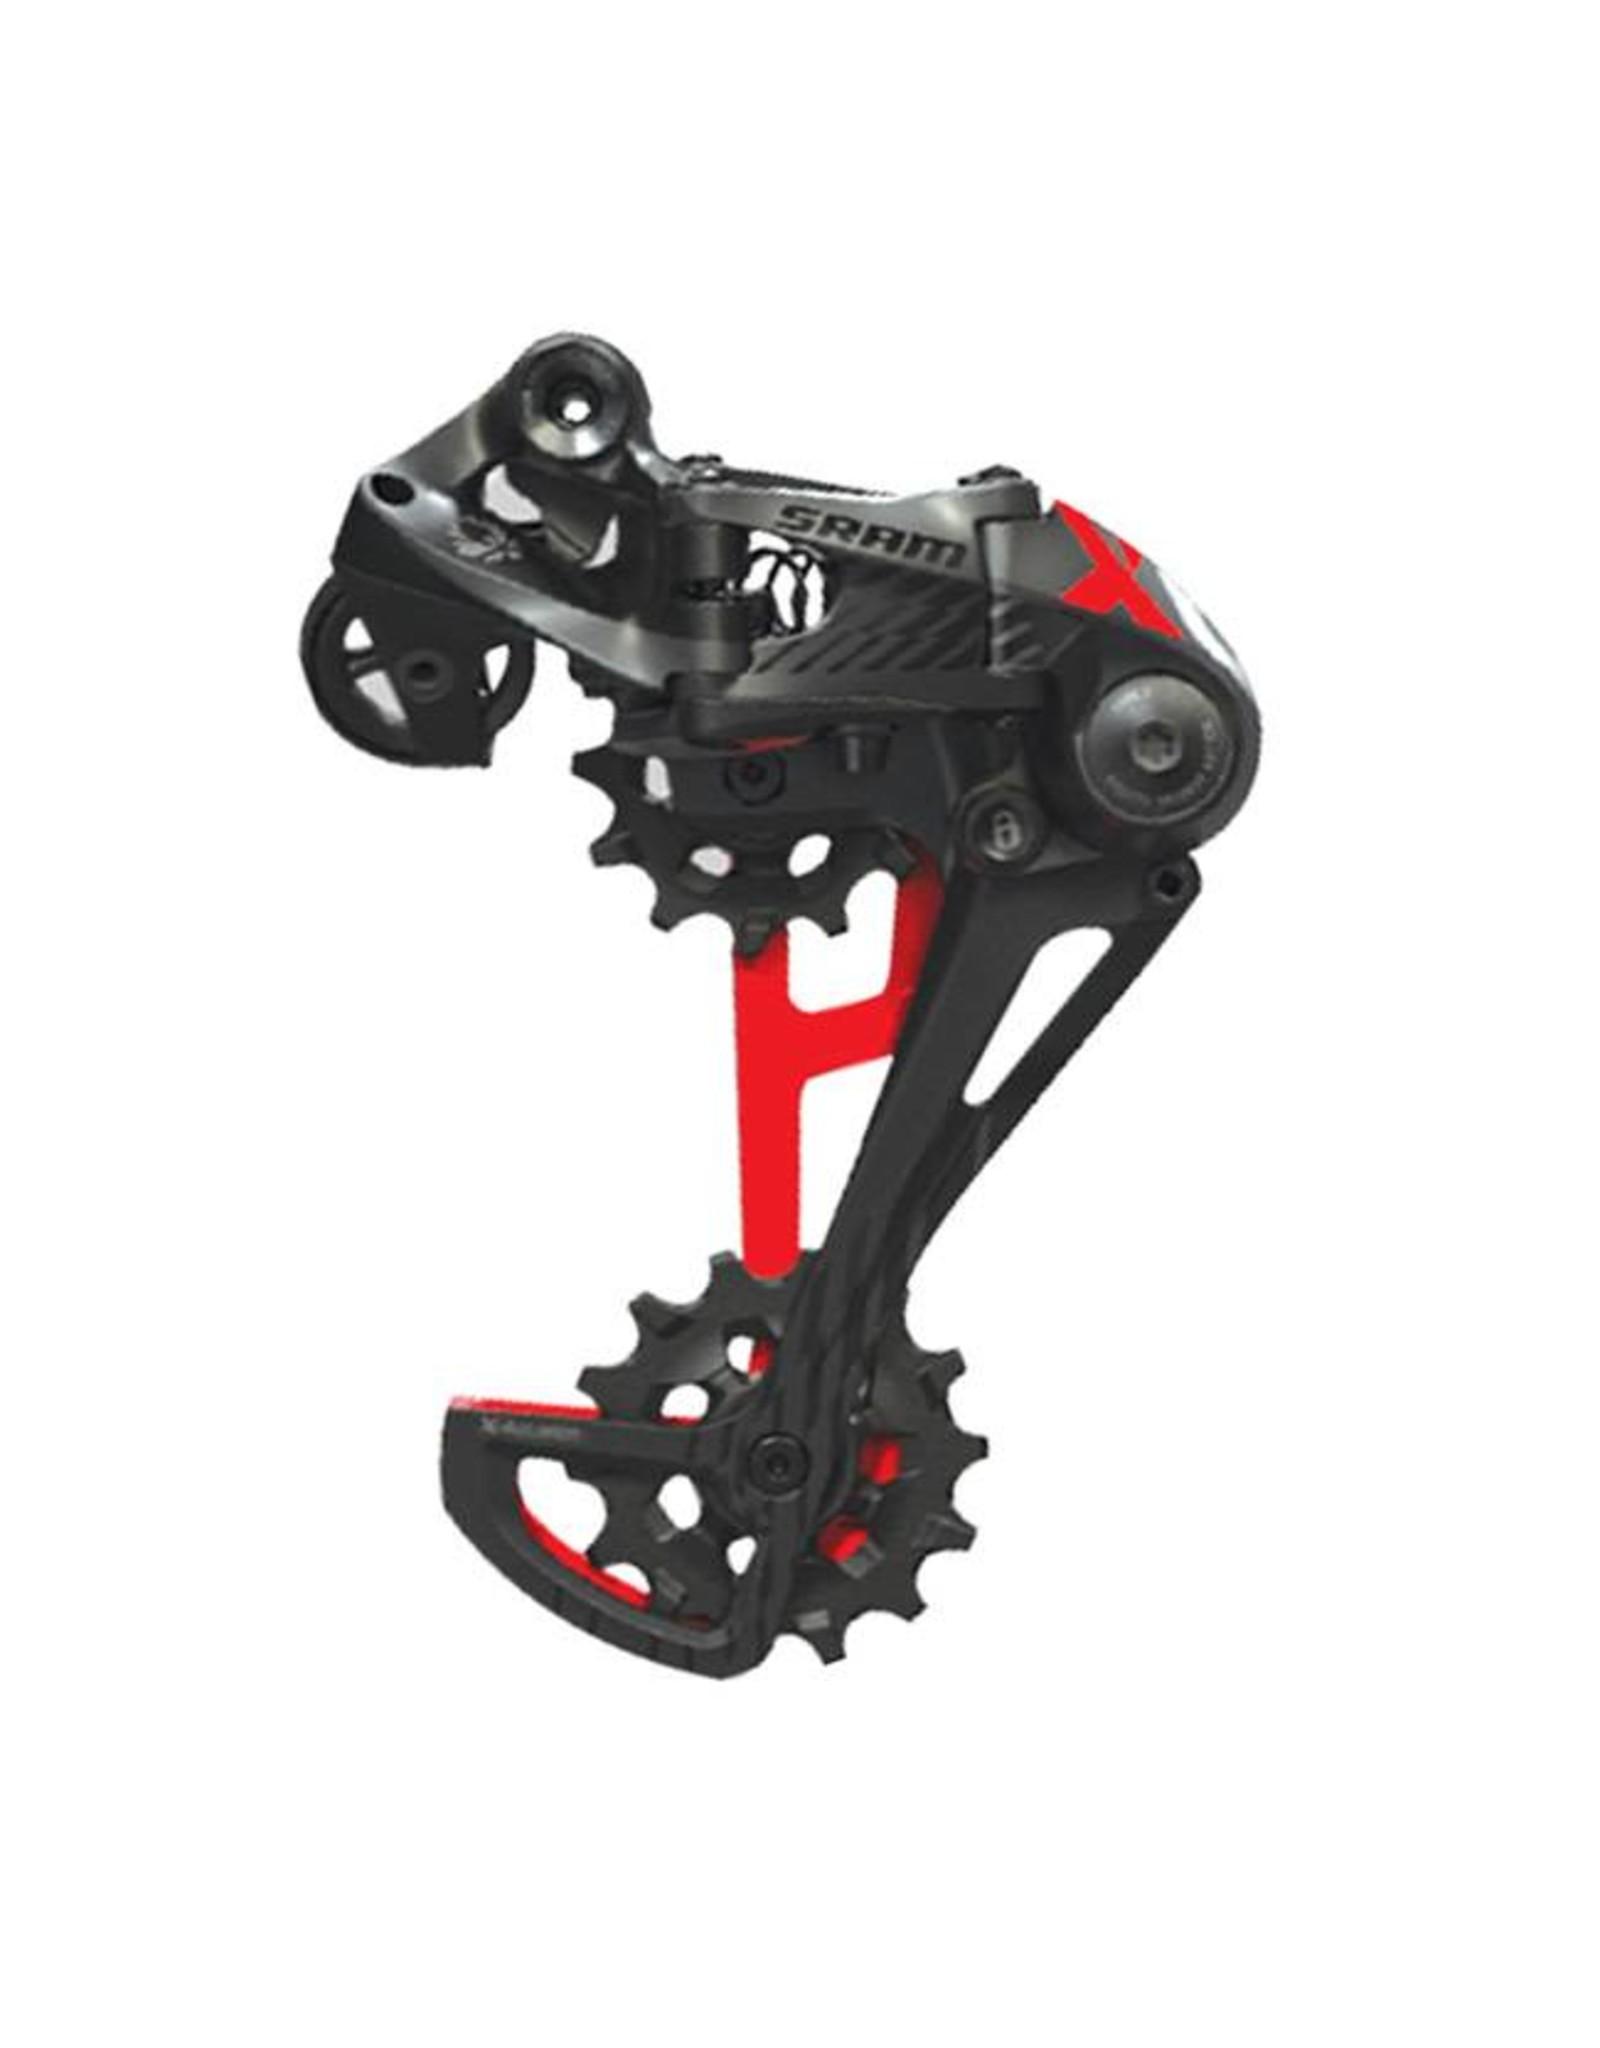 SRAM SRAM X01 Eagle 12-Speed Type 3 Rear Derailleur, Black with Red Trim